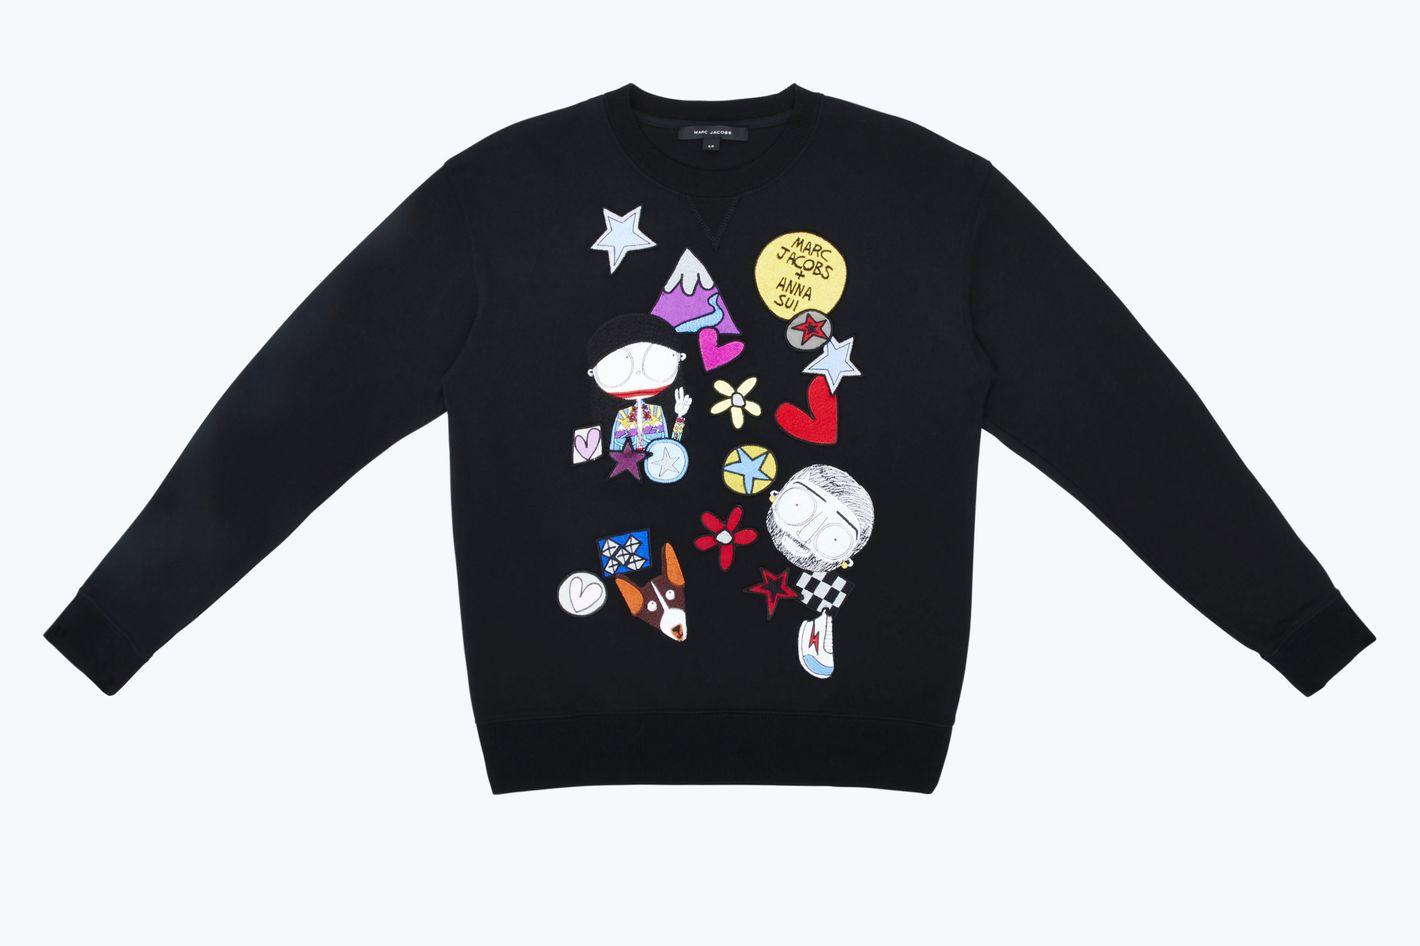 Marc & Anna Embroidered Sweatshirt